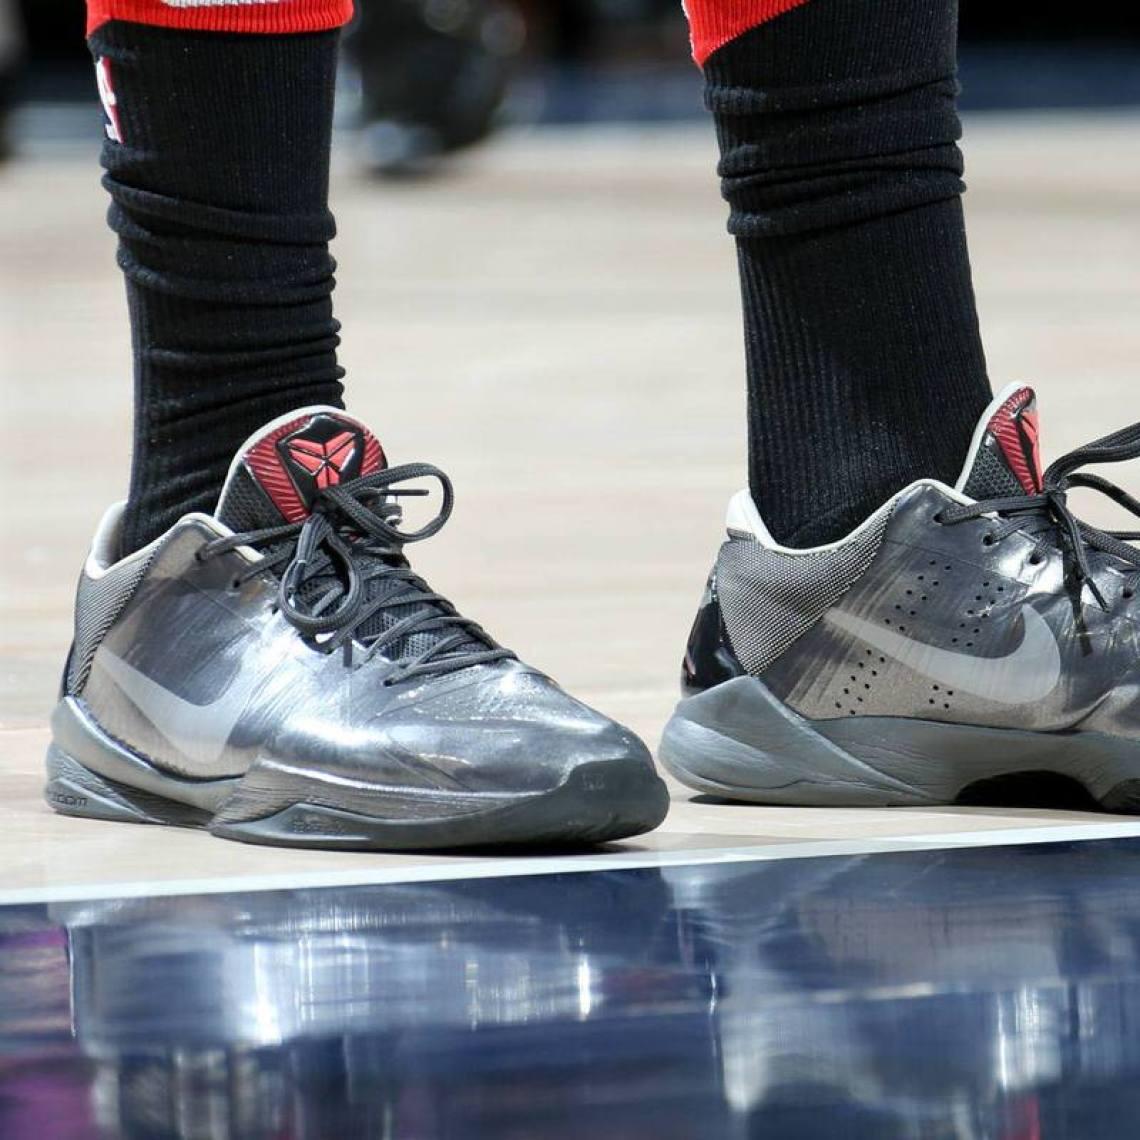 3a924c67f3f Every Sneaker Worn by P.J. Tucker This Season